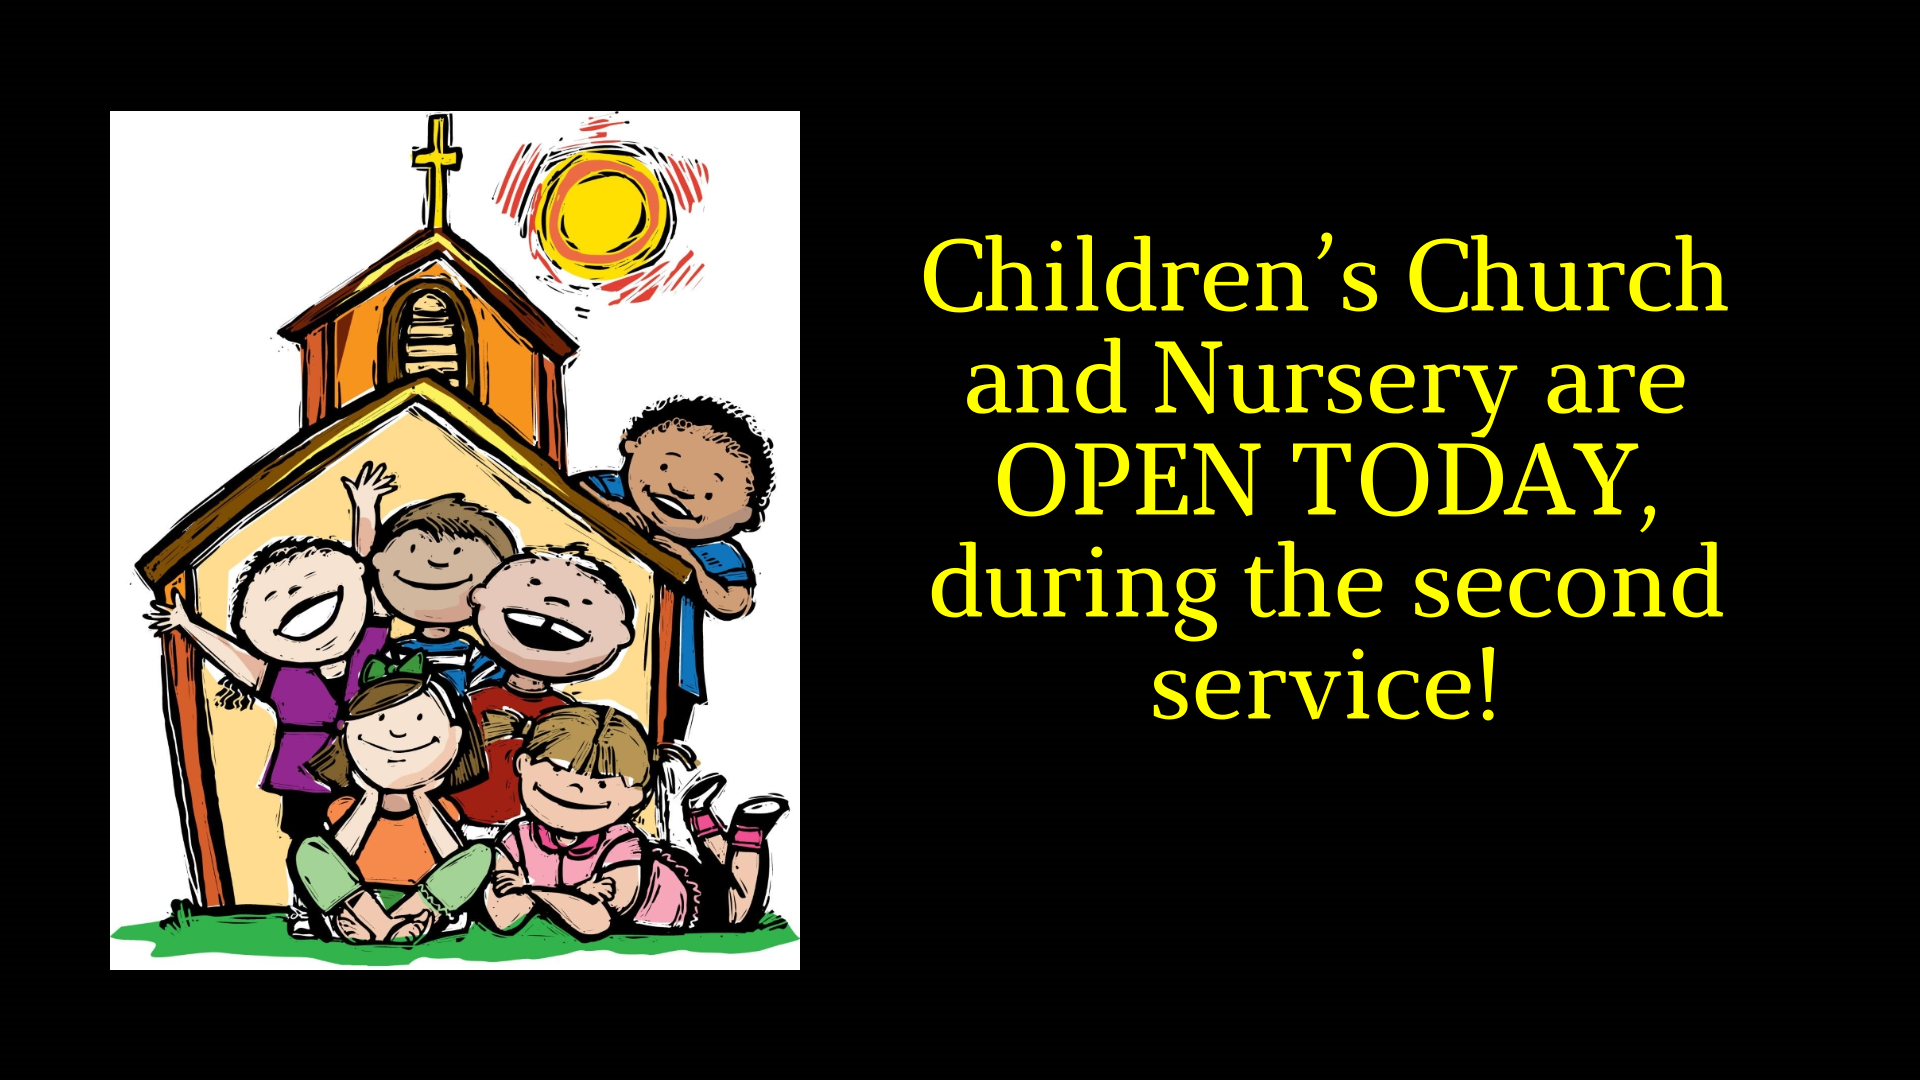 Website Announcement - Children's Church